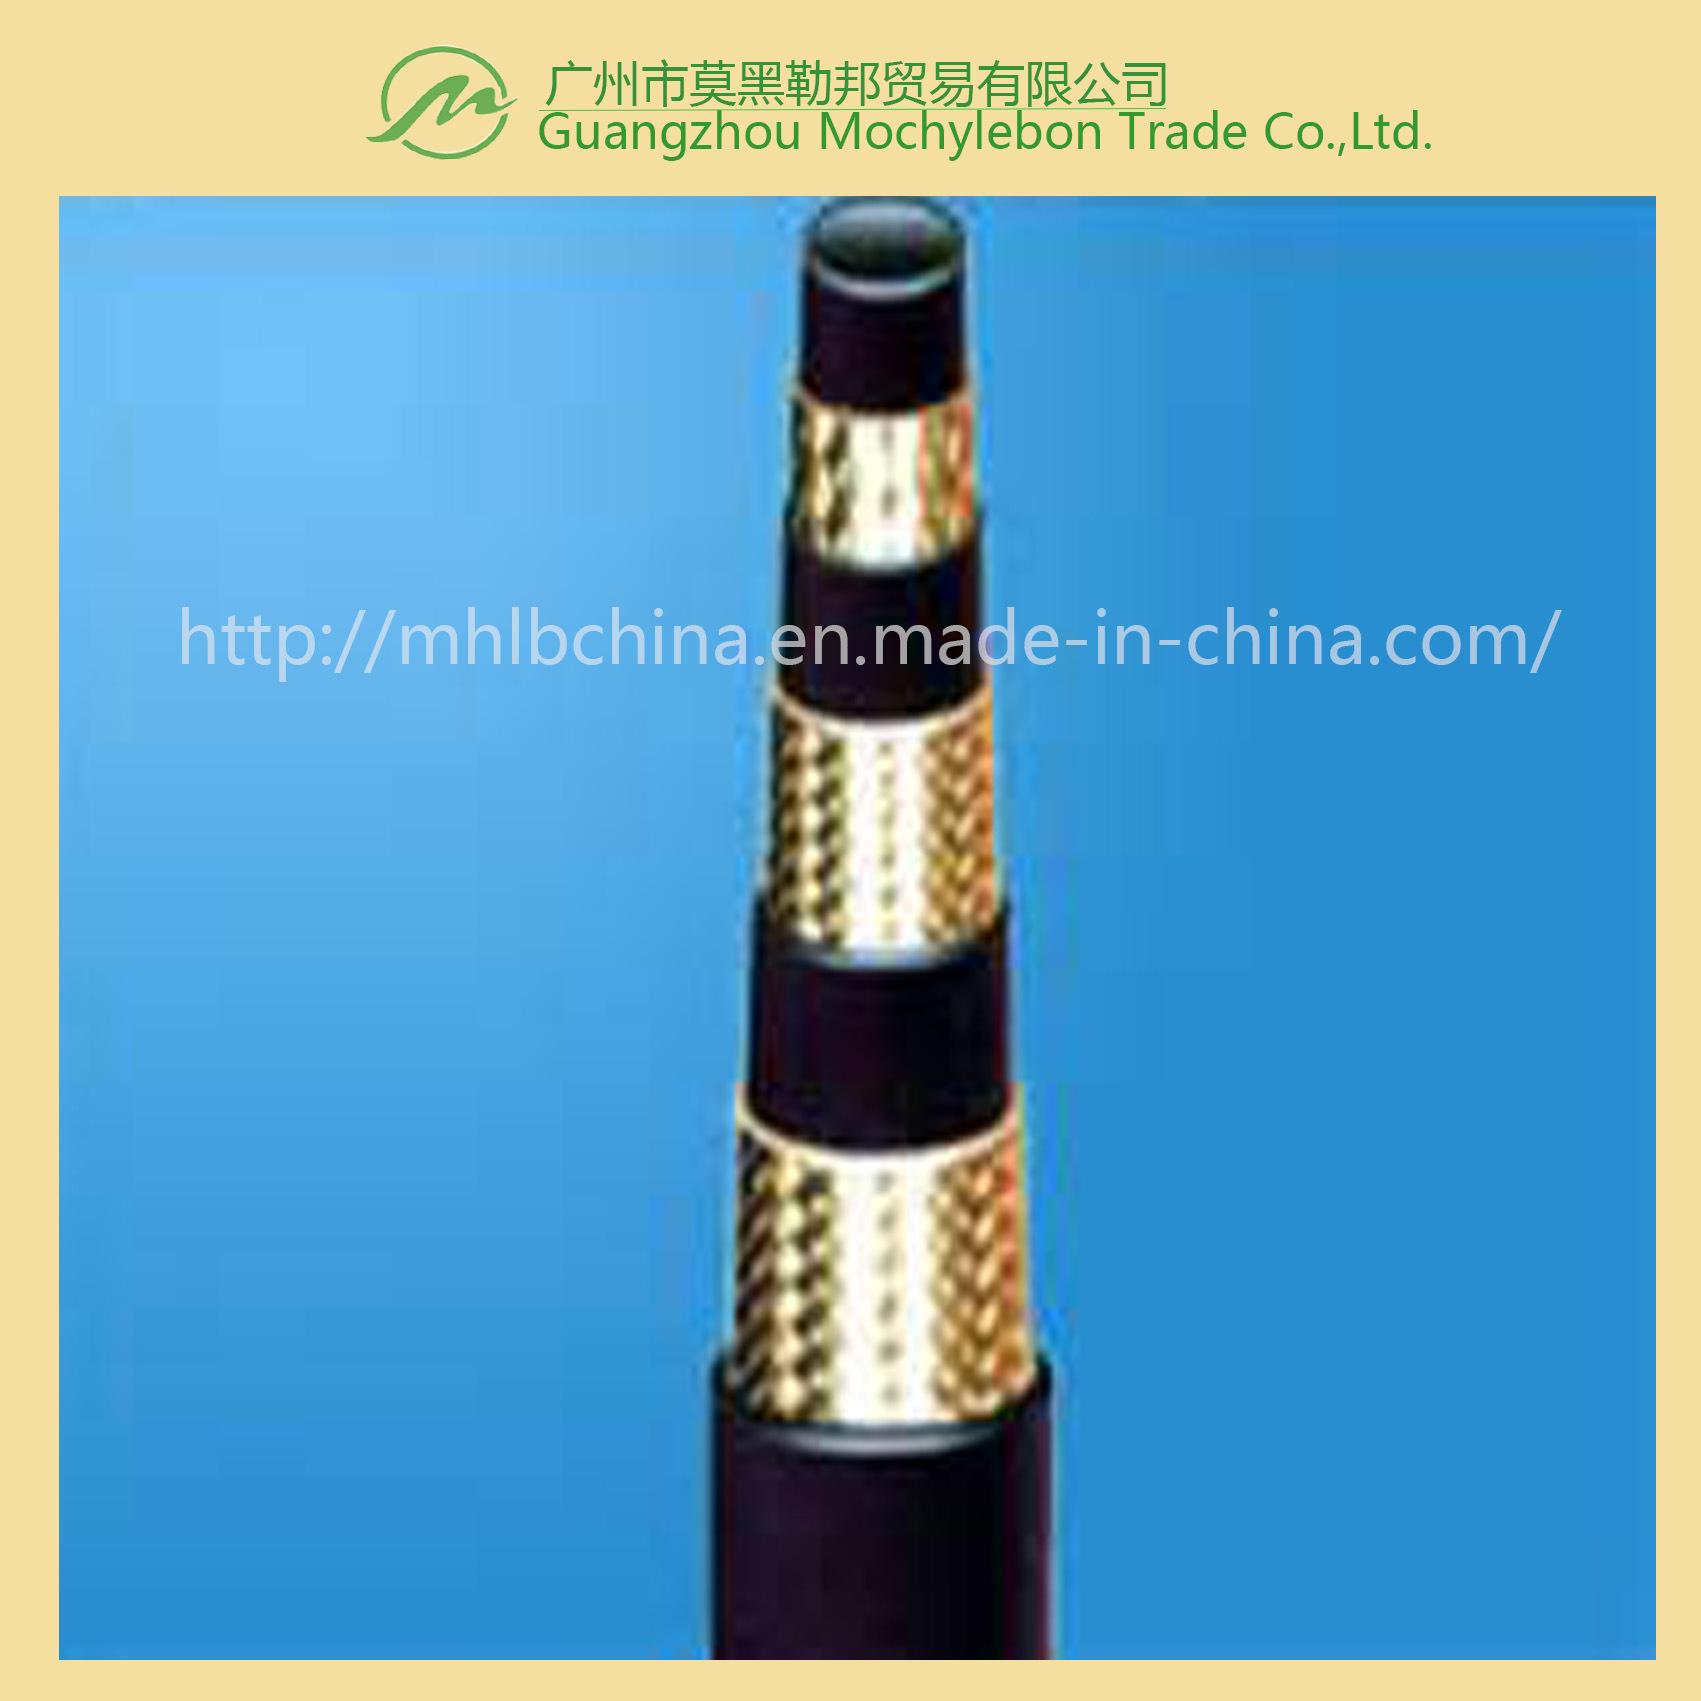 Wire Braided Hydraulic Hose for Coal Mine (602-3B-1-1/4)